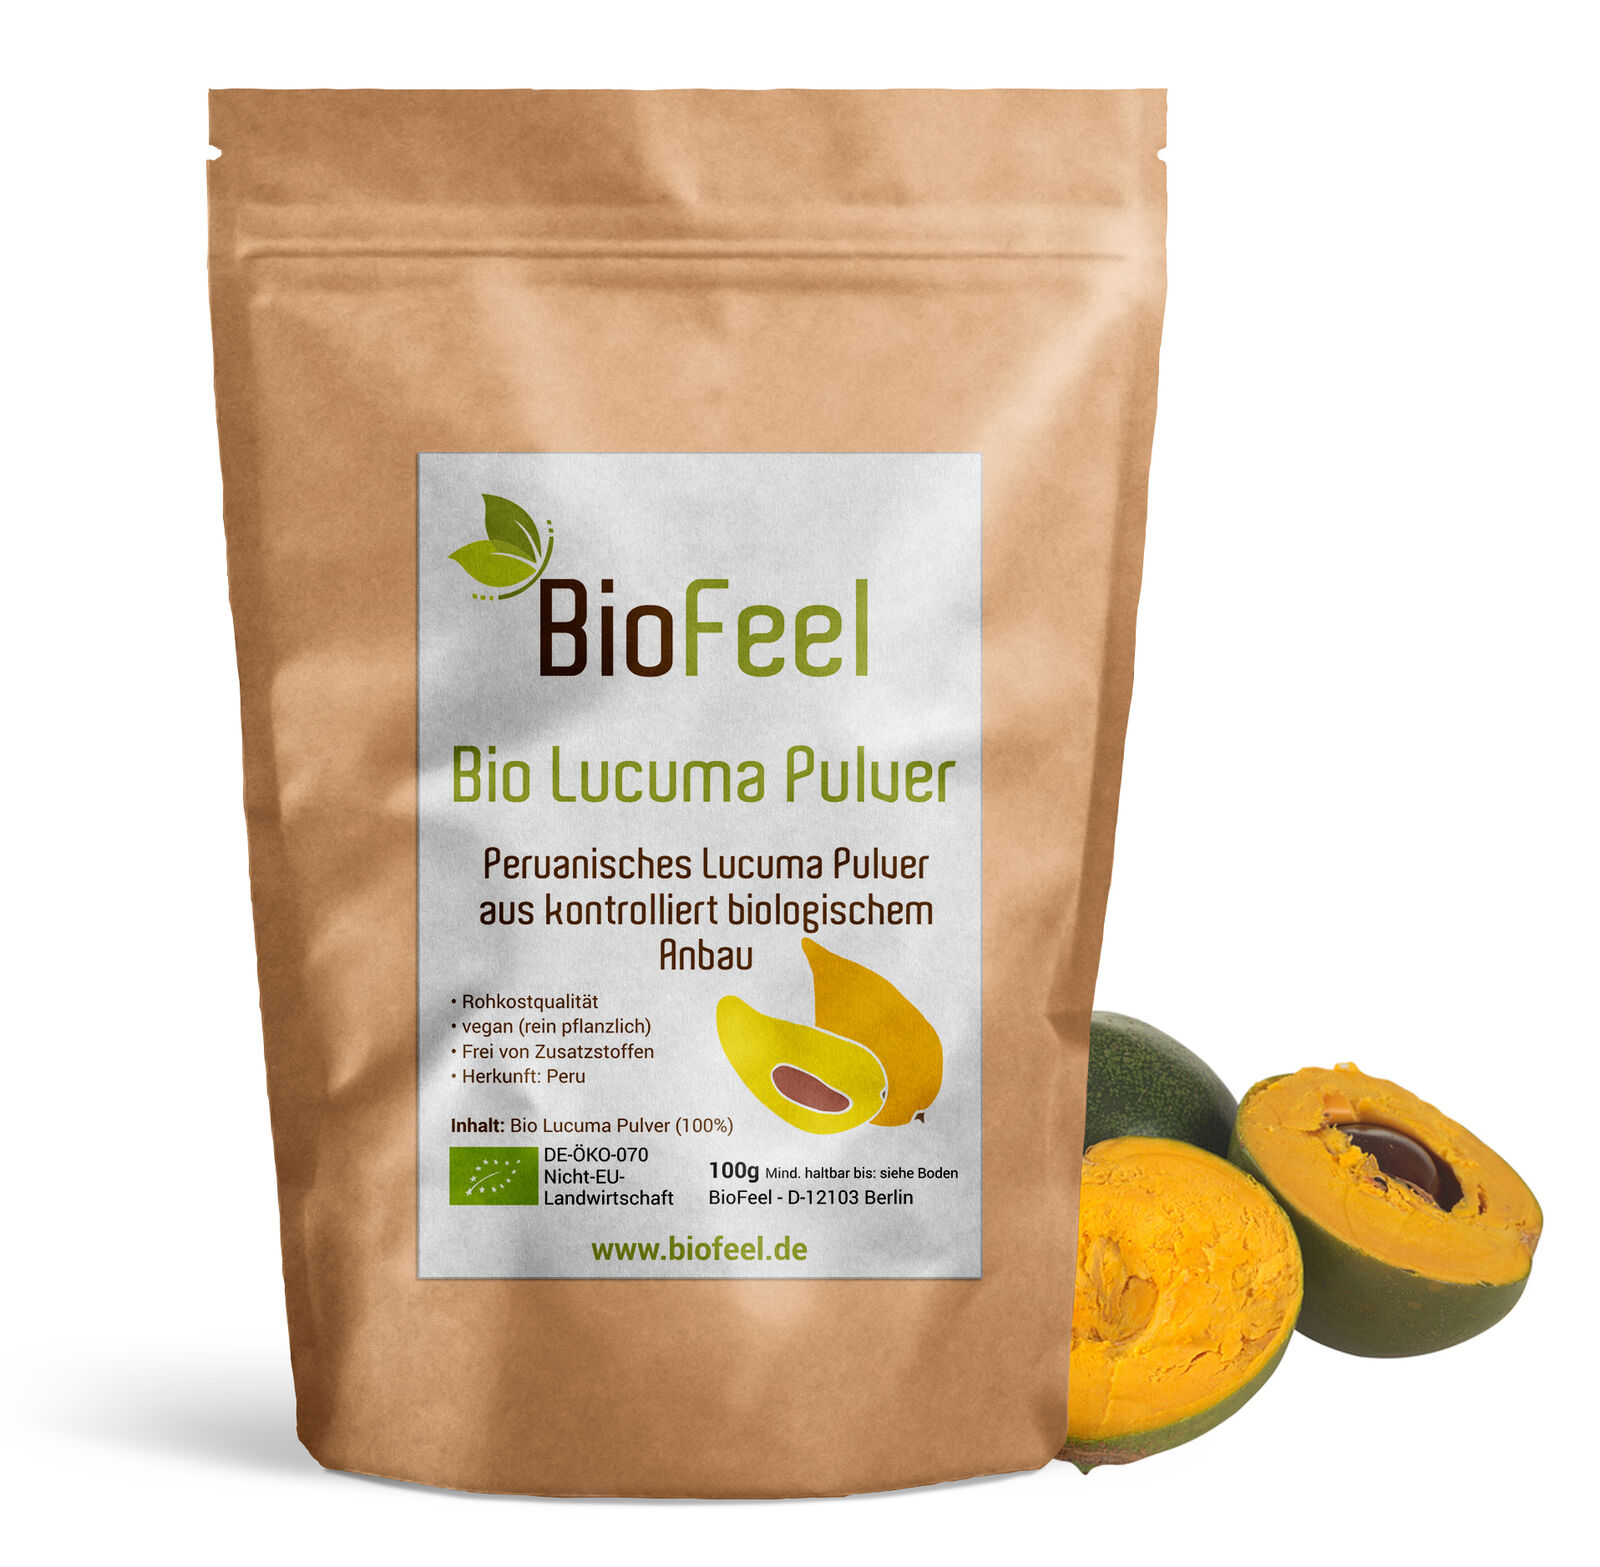 BioFeel - Bio Lucuma Pulver, 100g